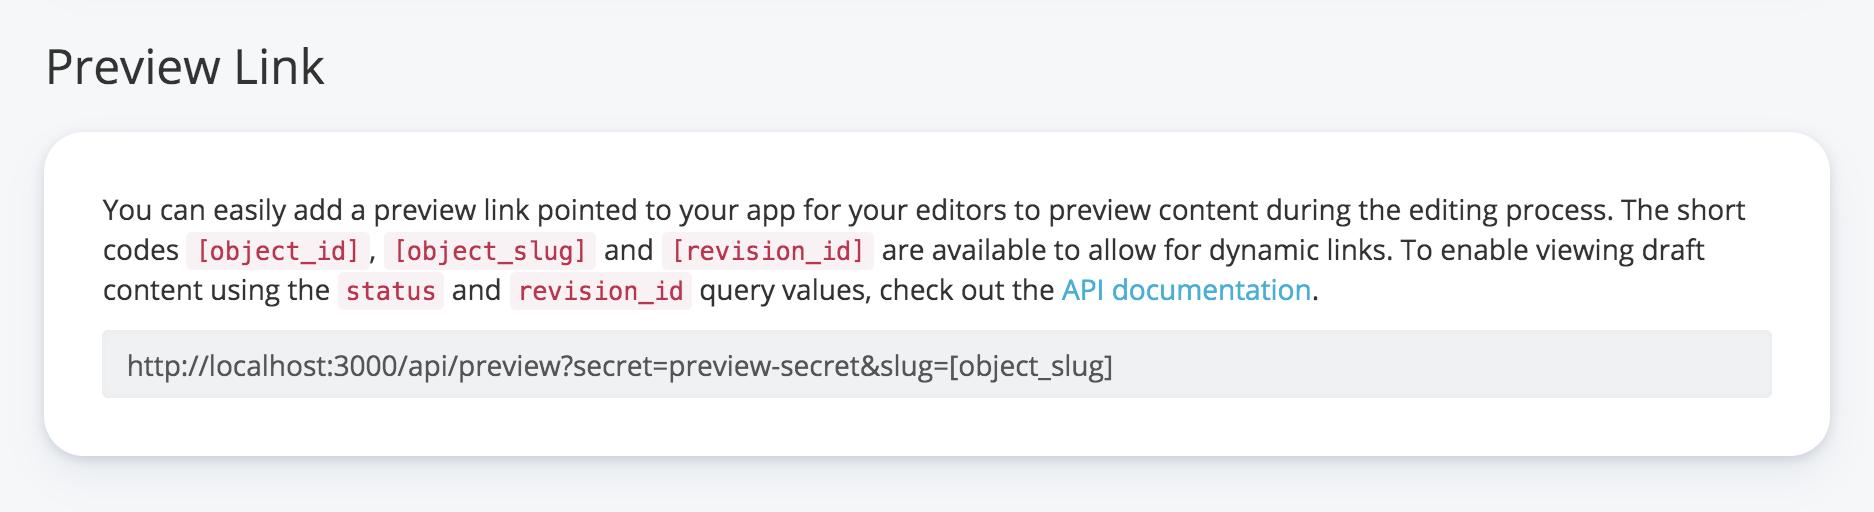 Preview Link Screenshot